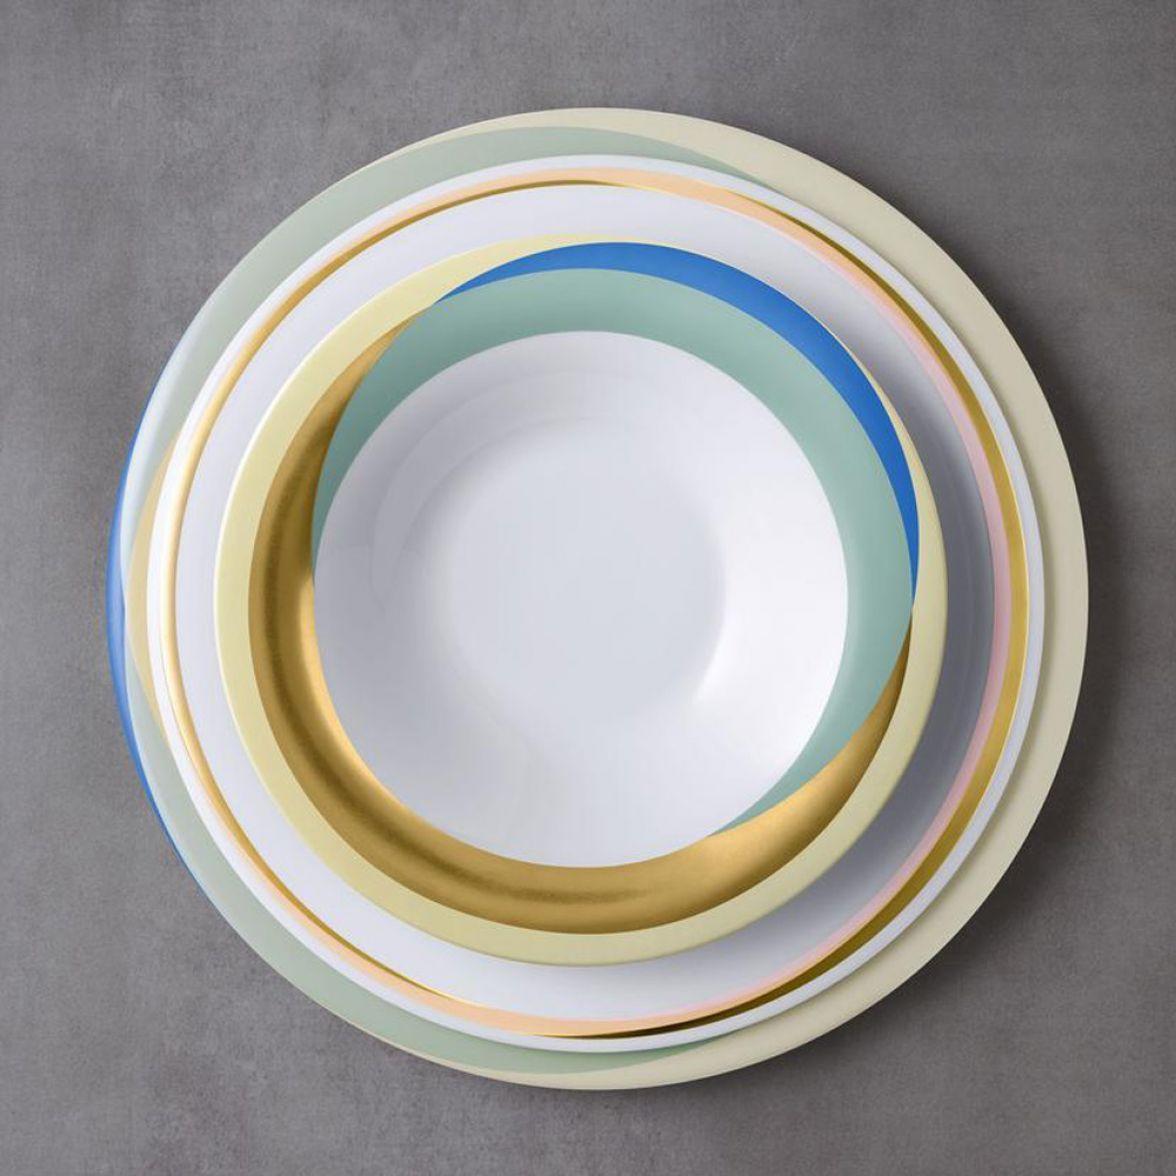 Fluen shiting colour table set